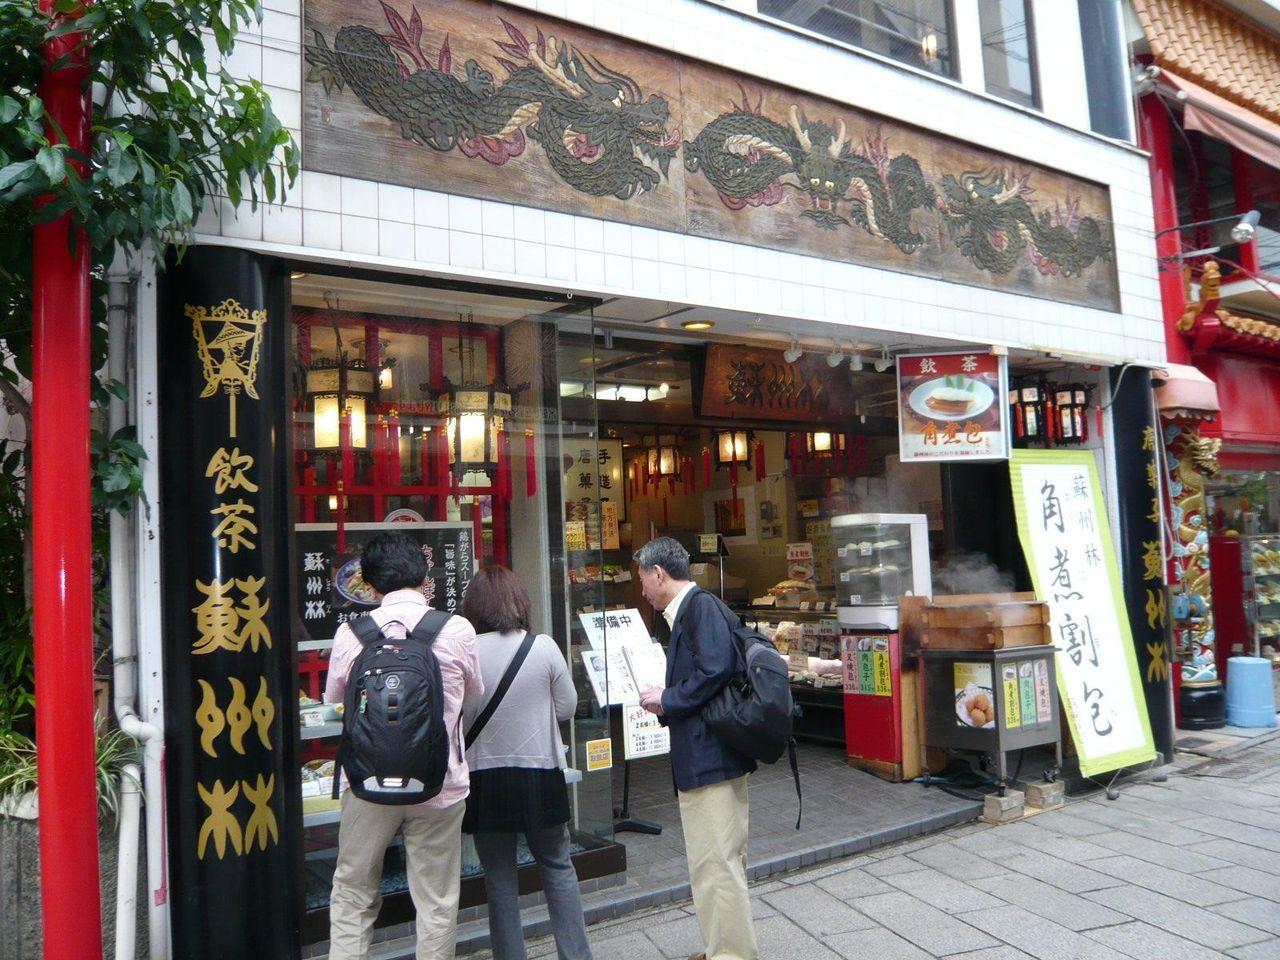 新地中華街の人気店「蘇州林」